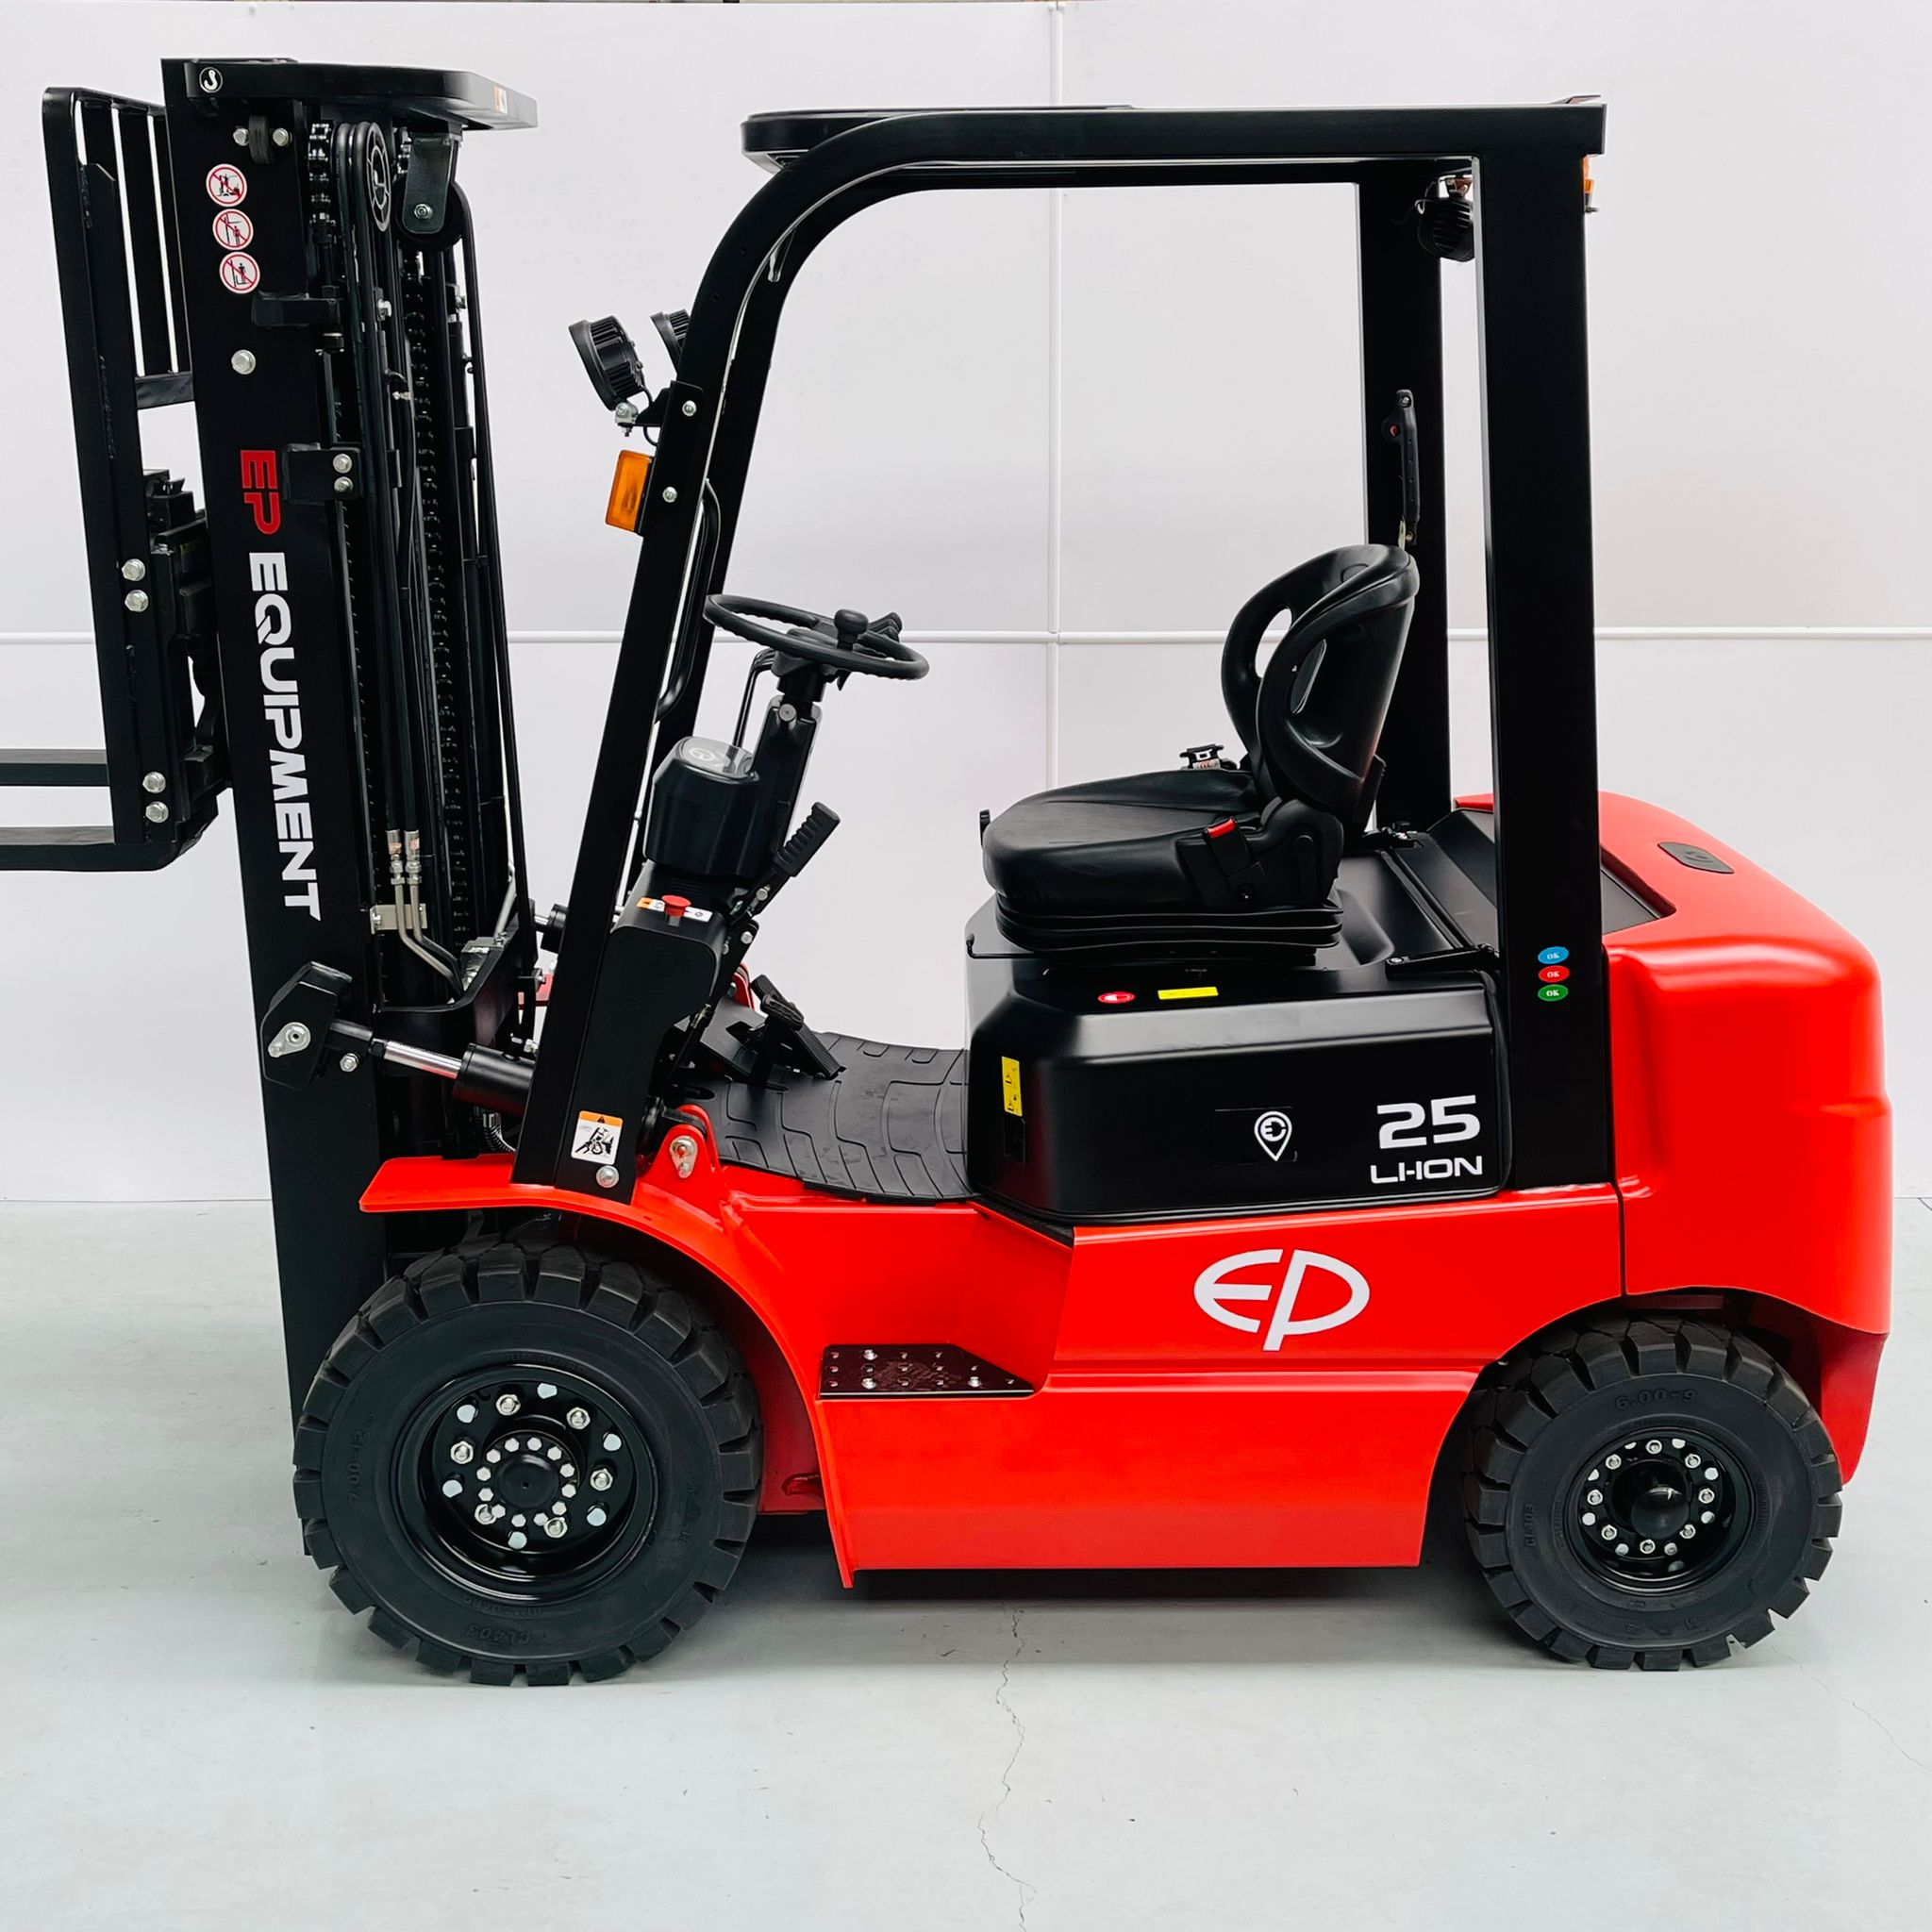 EP EFL25s Serial 130150904 #3706 WhatsApp Image 2021-09-02 at 10.33.14 AM (24)